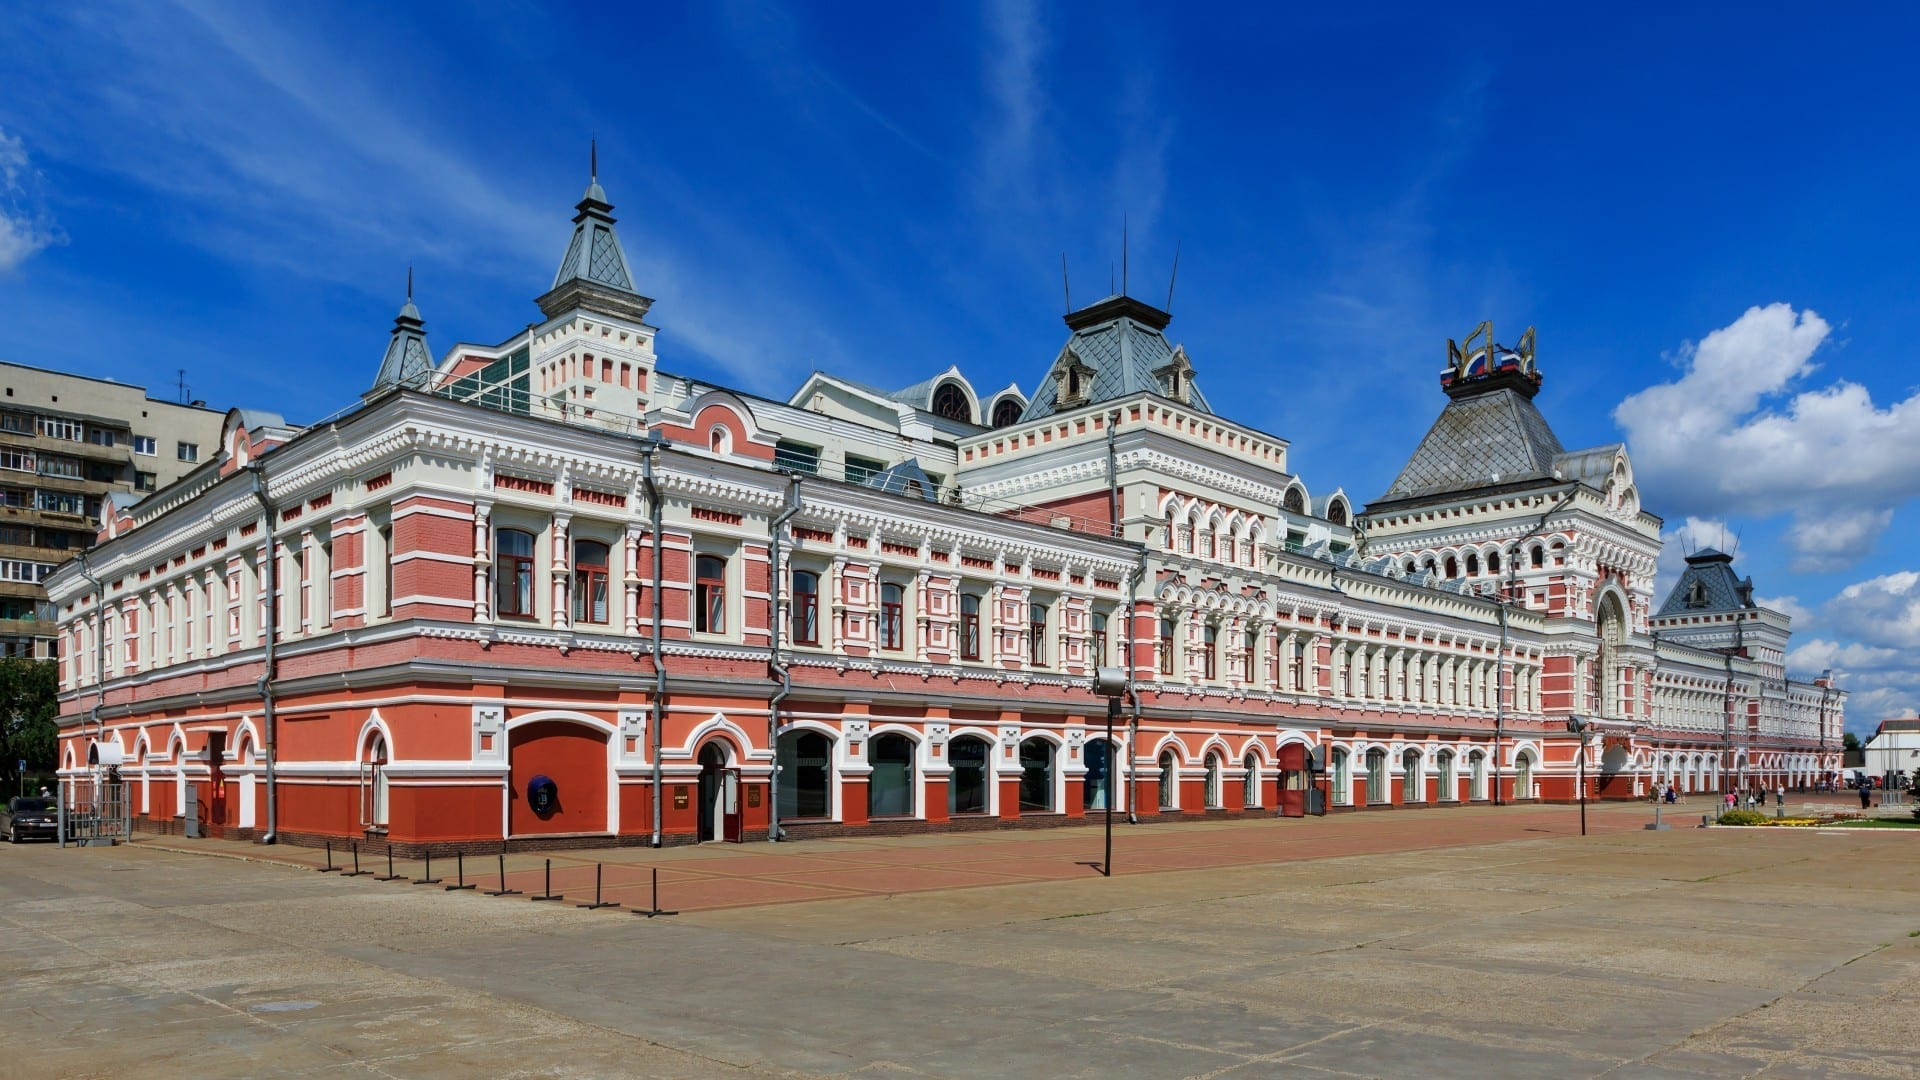 Sala de Exposiciones de la Feria Nizhny Novgorod Rusia